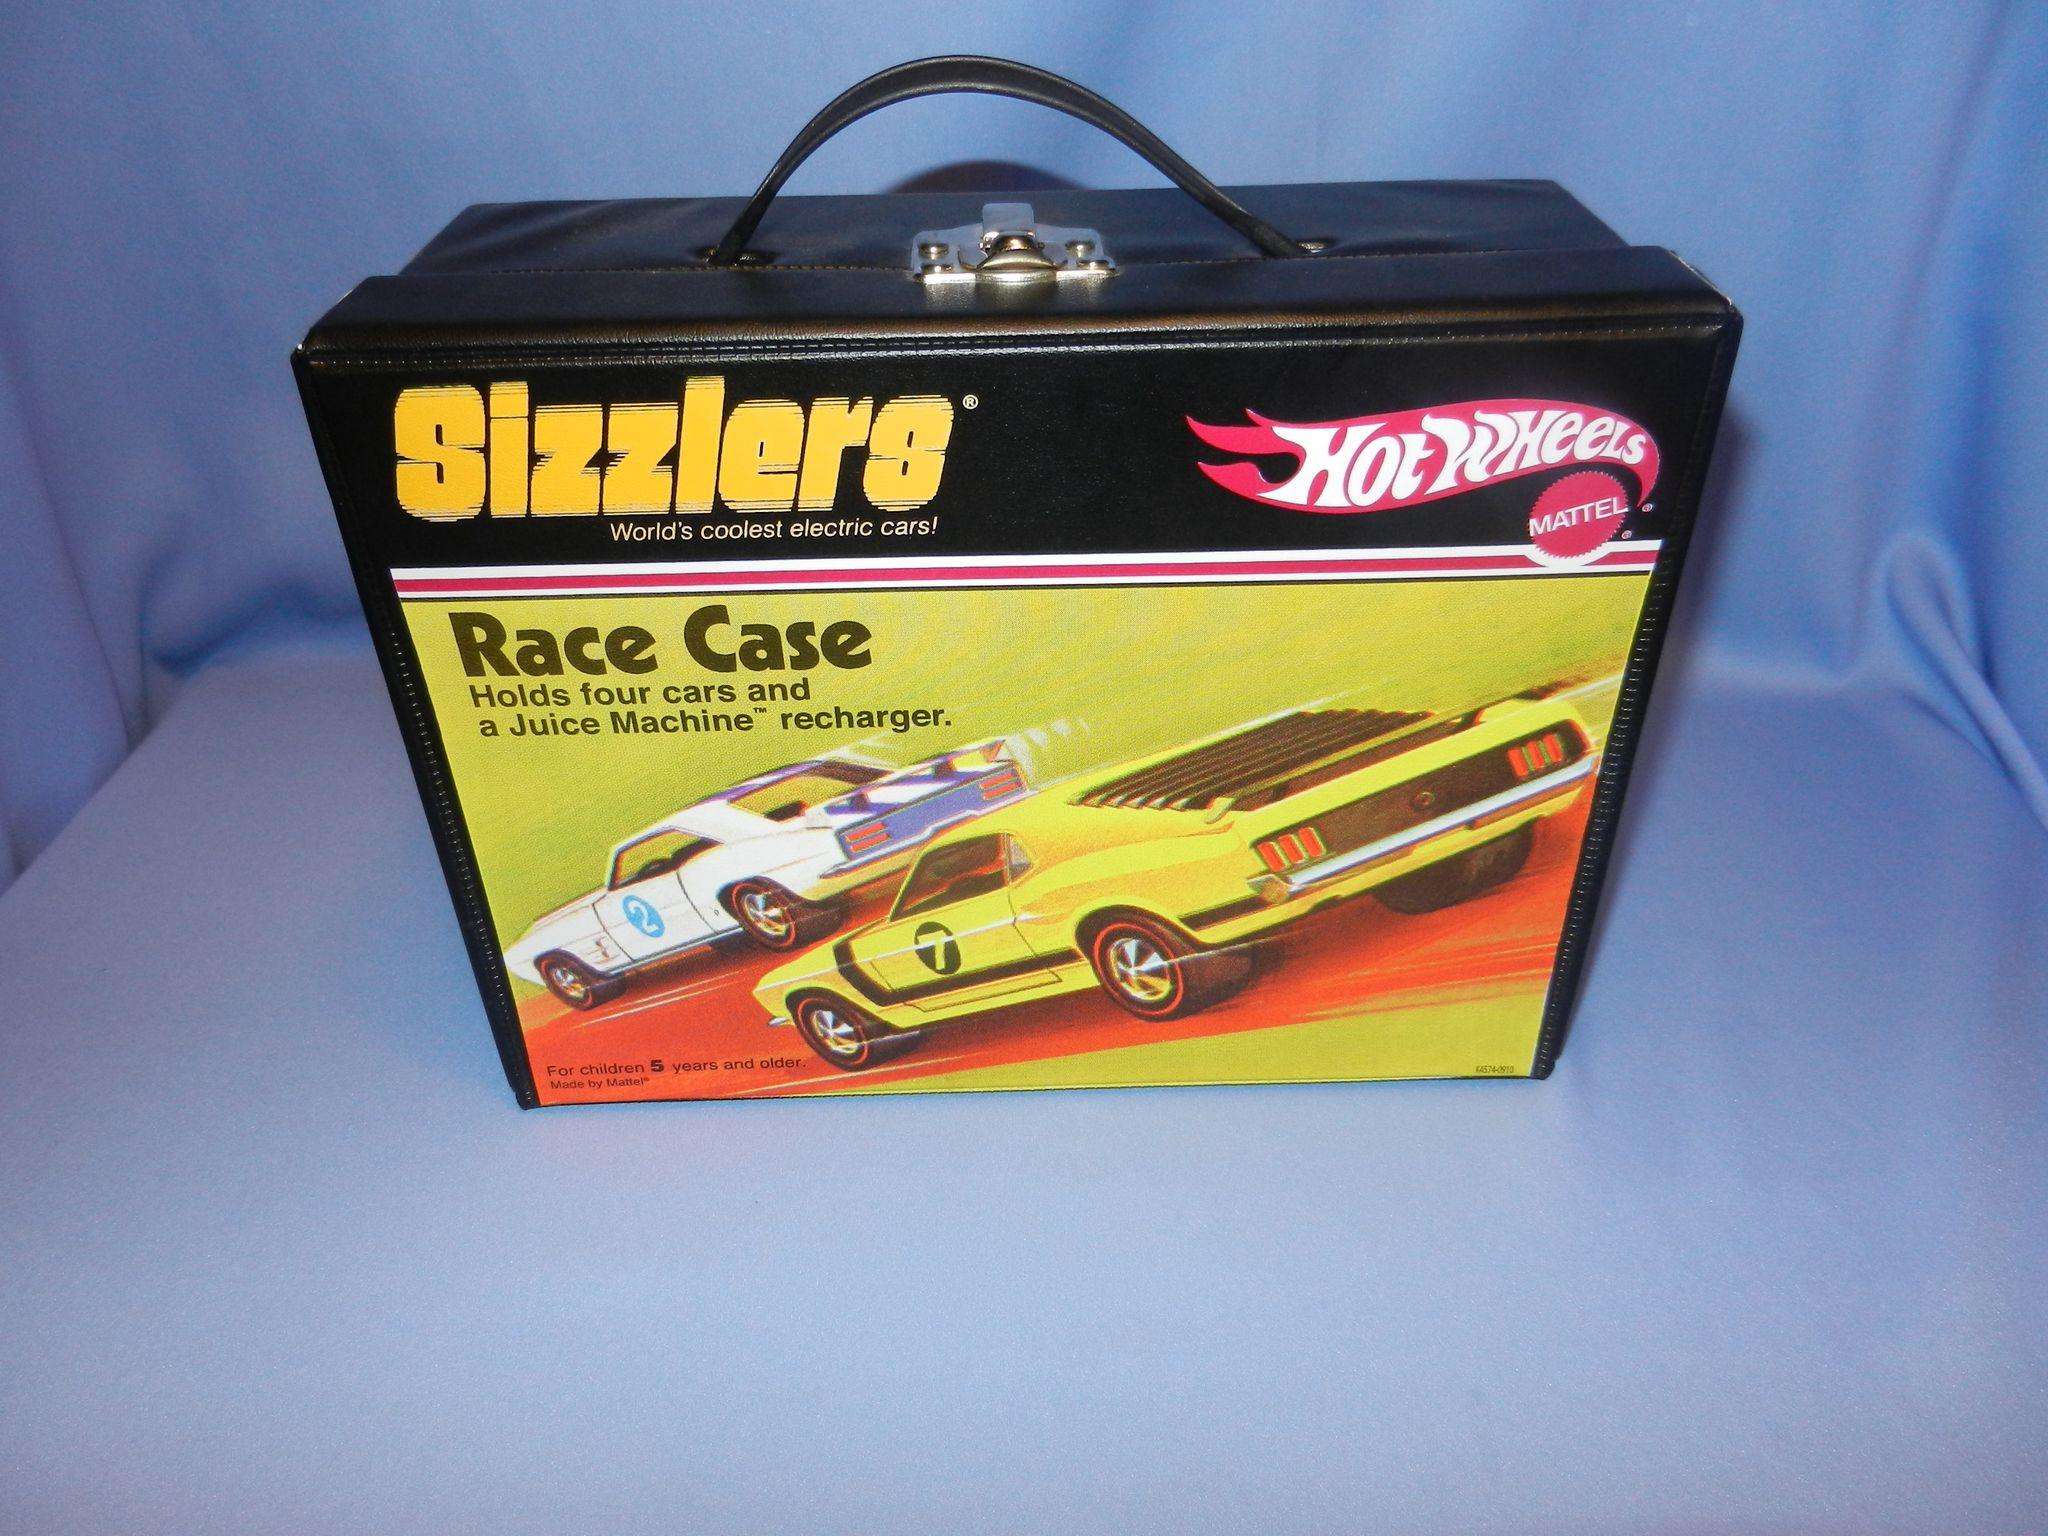 Vintage Hot Wheels Sizzlers Race Case From Mygrandmotherhadone On